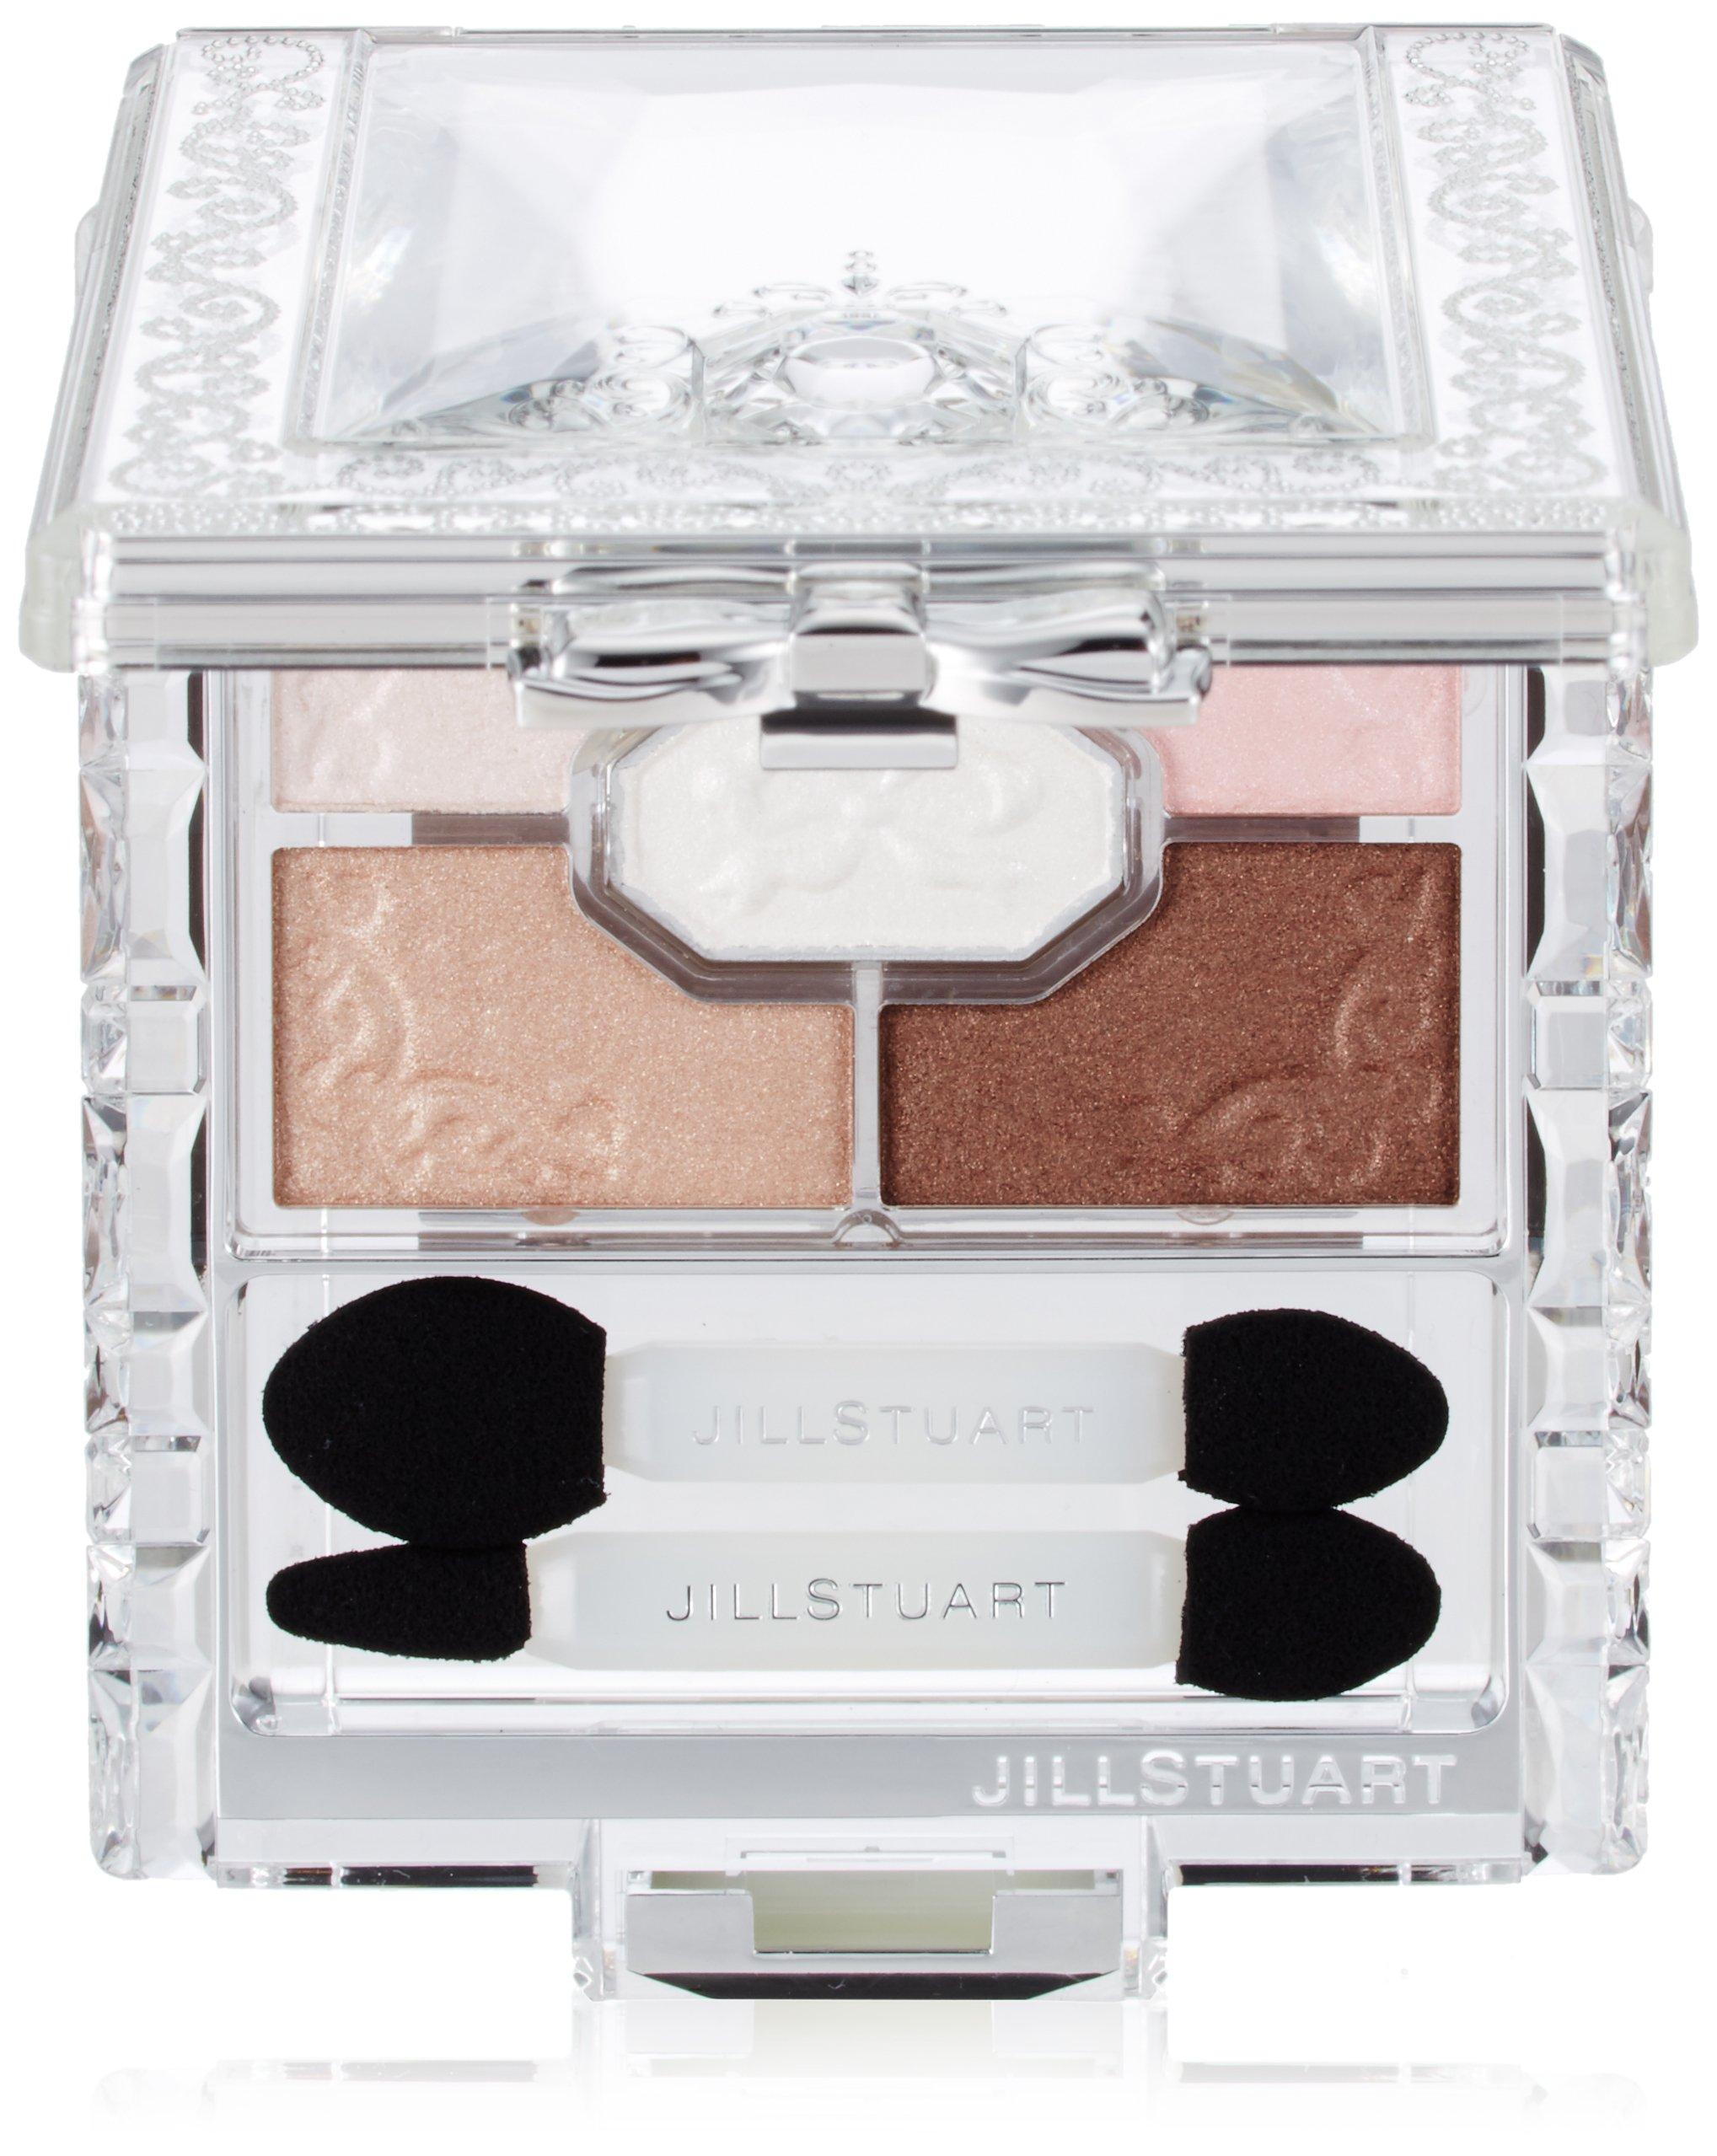 Jill Stuart Ribbon Couture Eyes 0.16oz, 4.7g 01 Engagement Lace